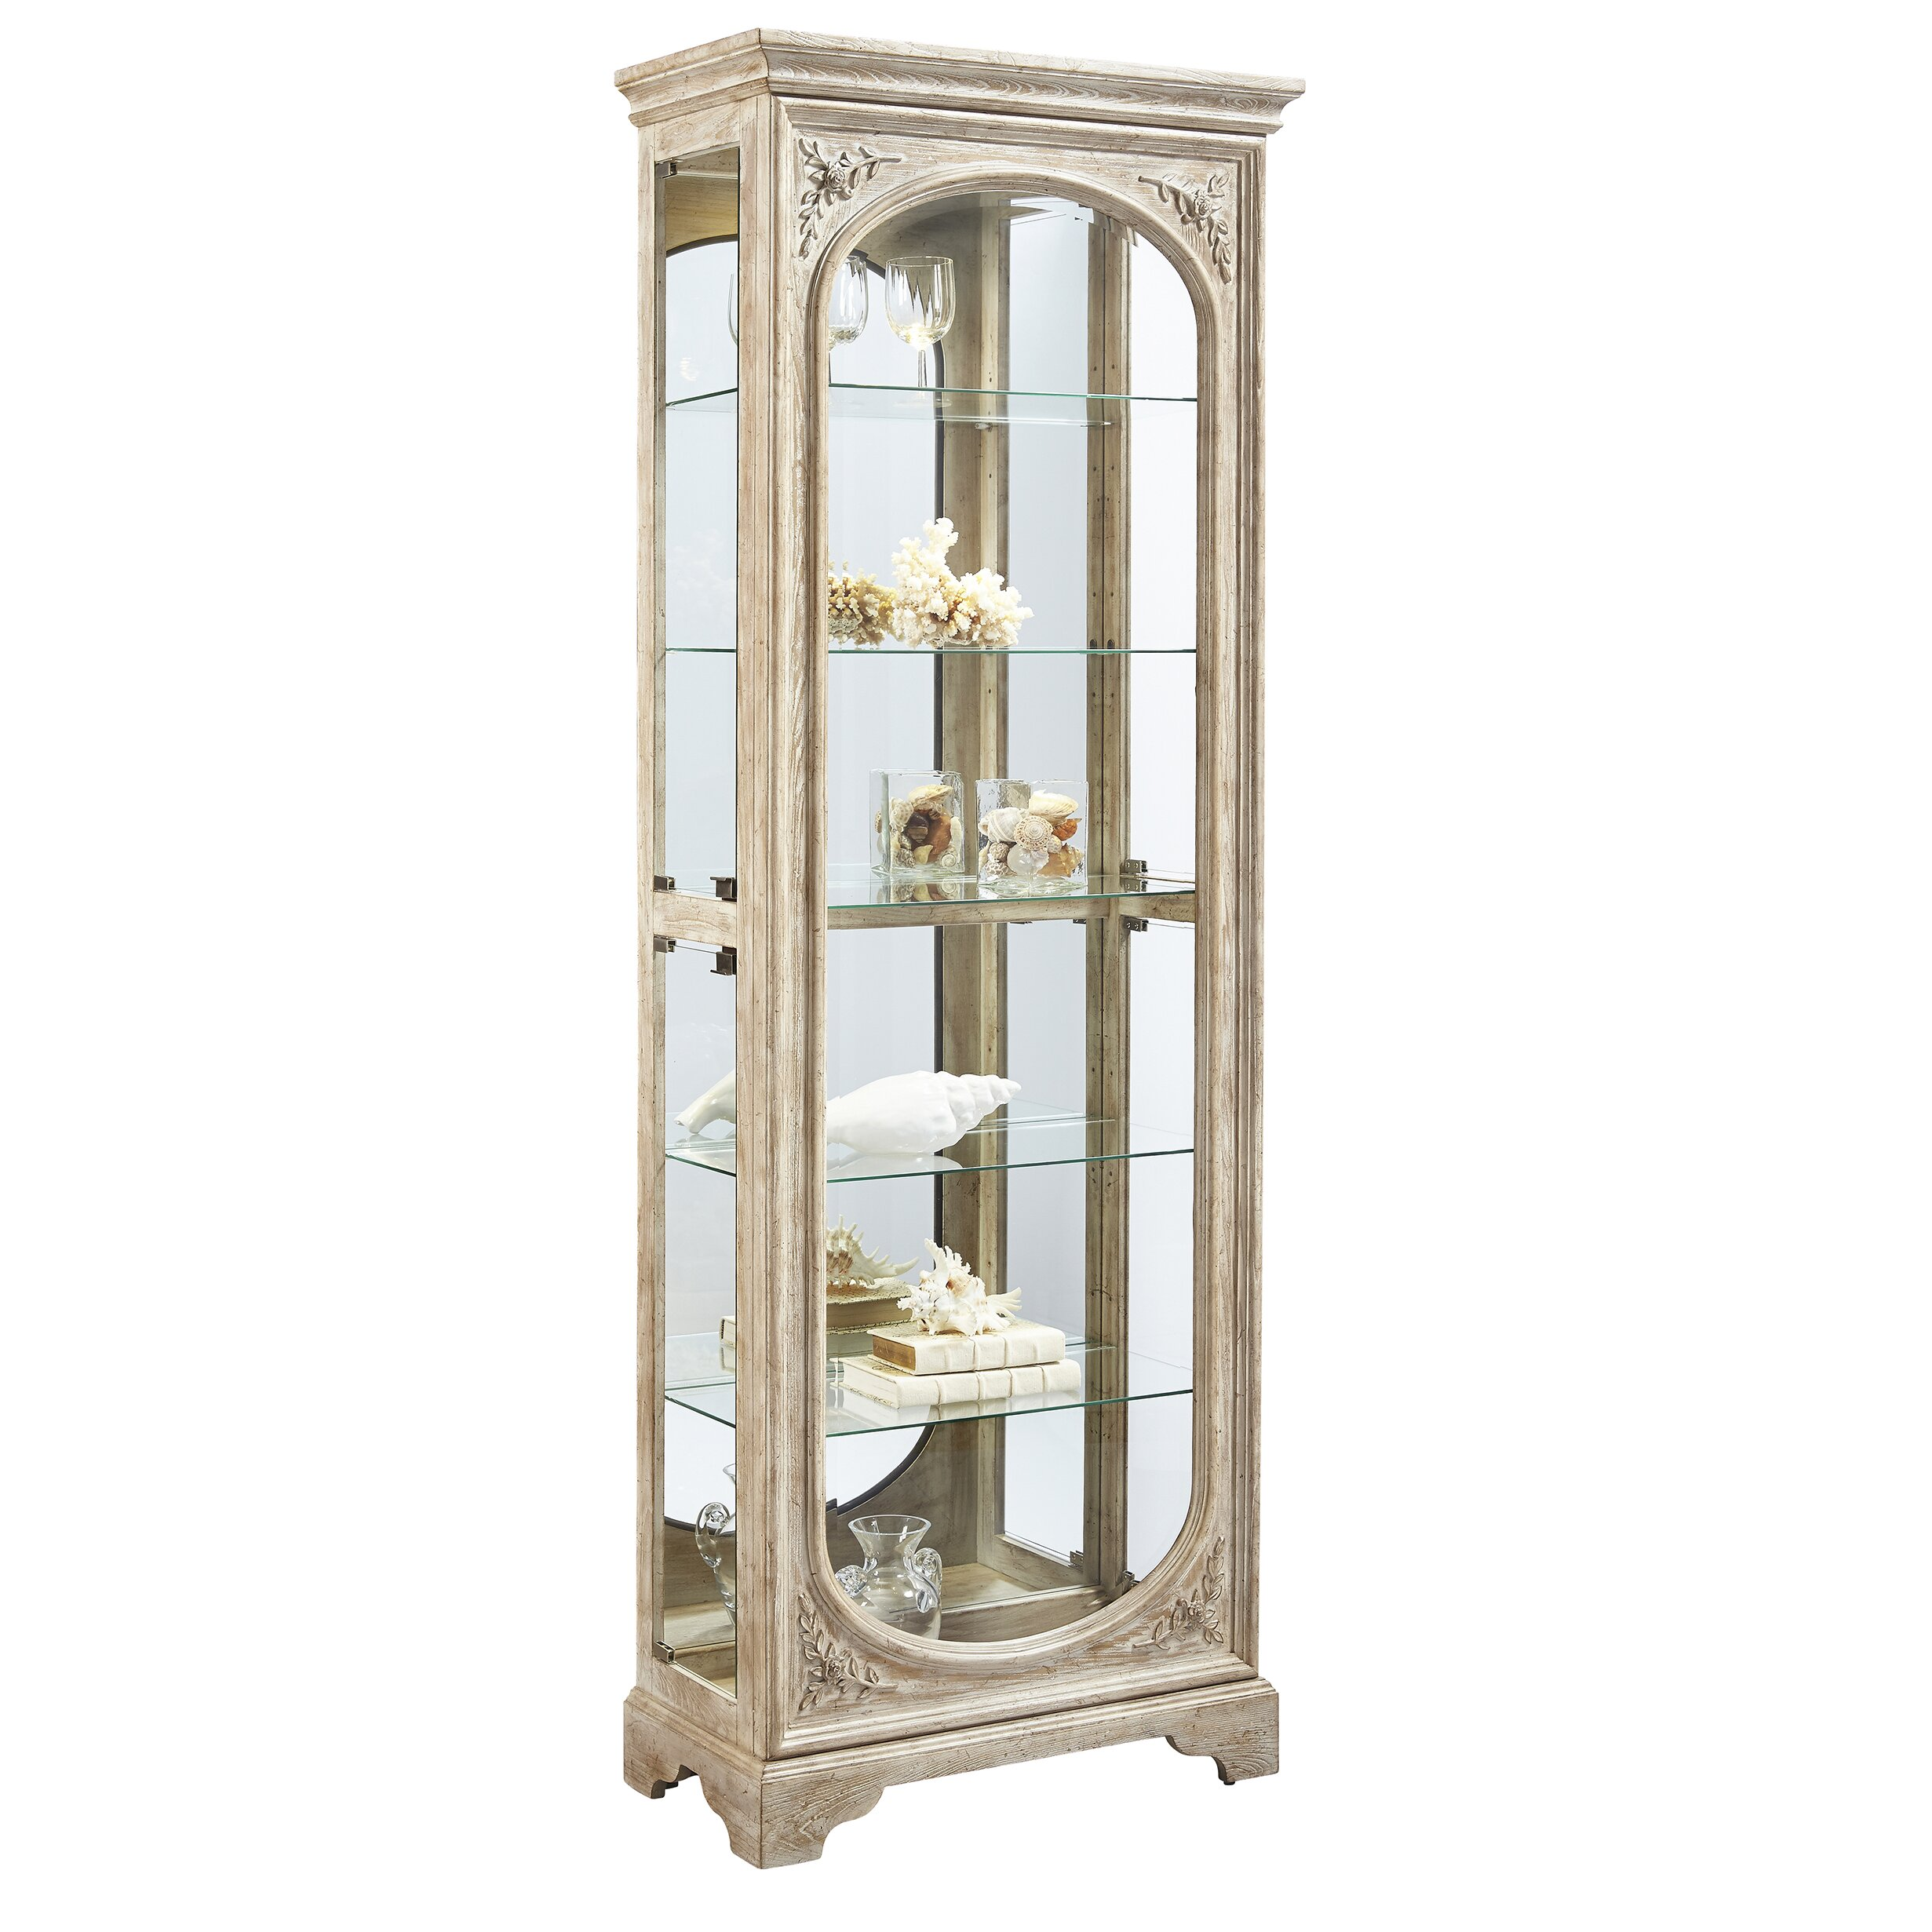 Pulaski-Furniture-9-Piece-Counter-Height-Dining-Set-Costco-2-640x480 Pulaski Dining Room Furniture